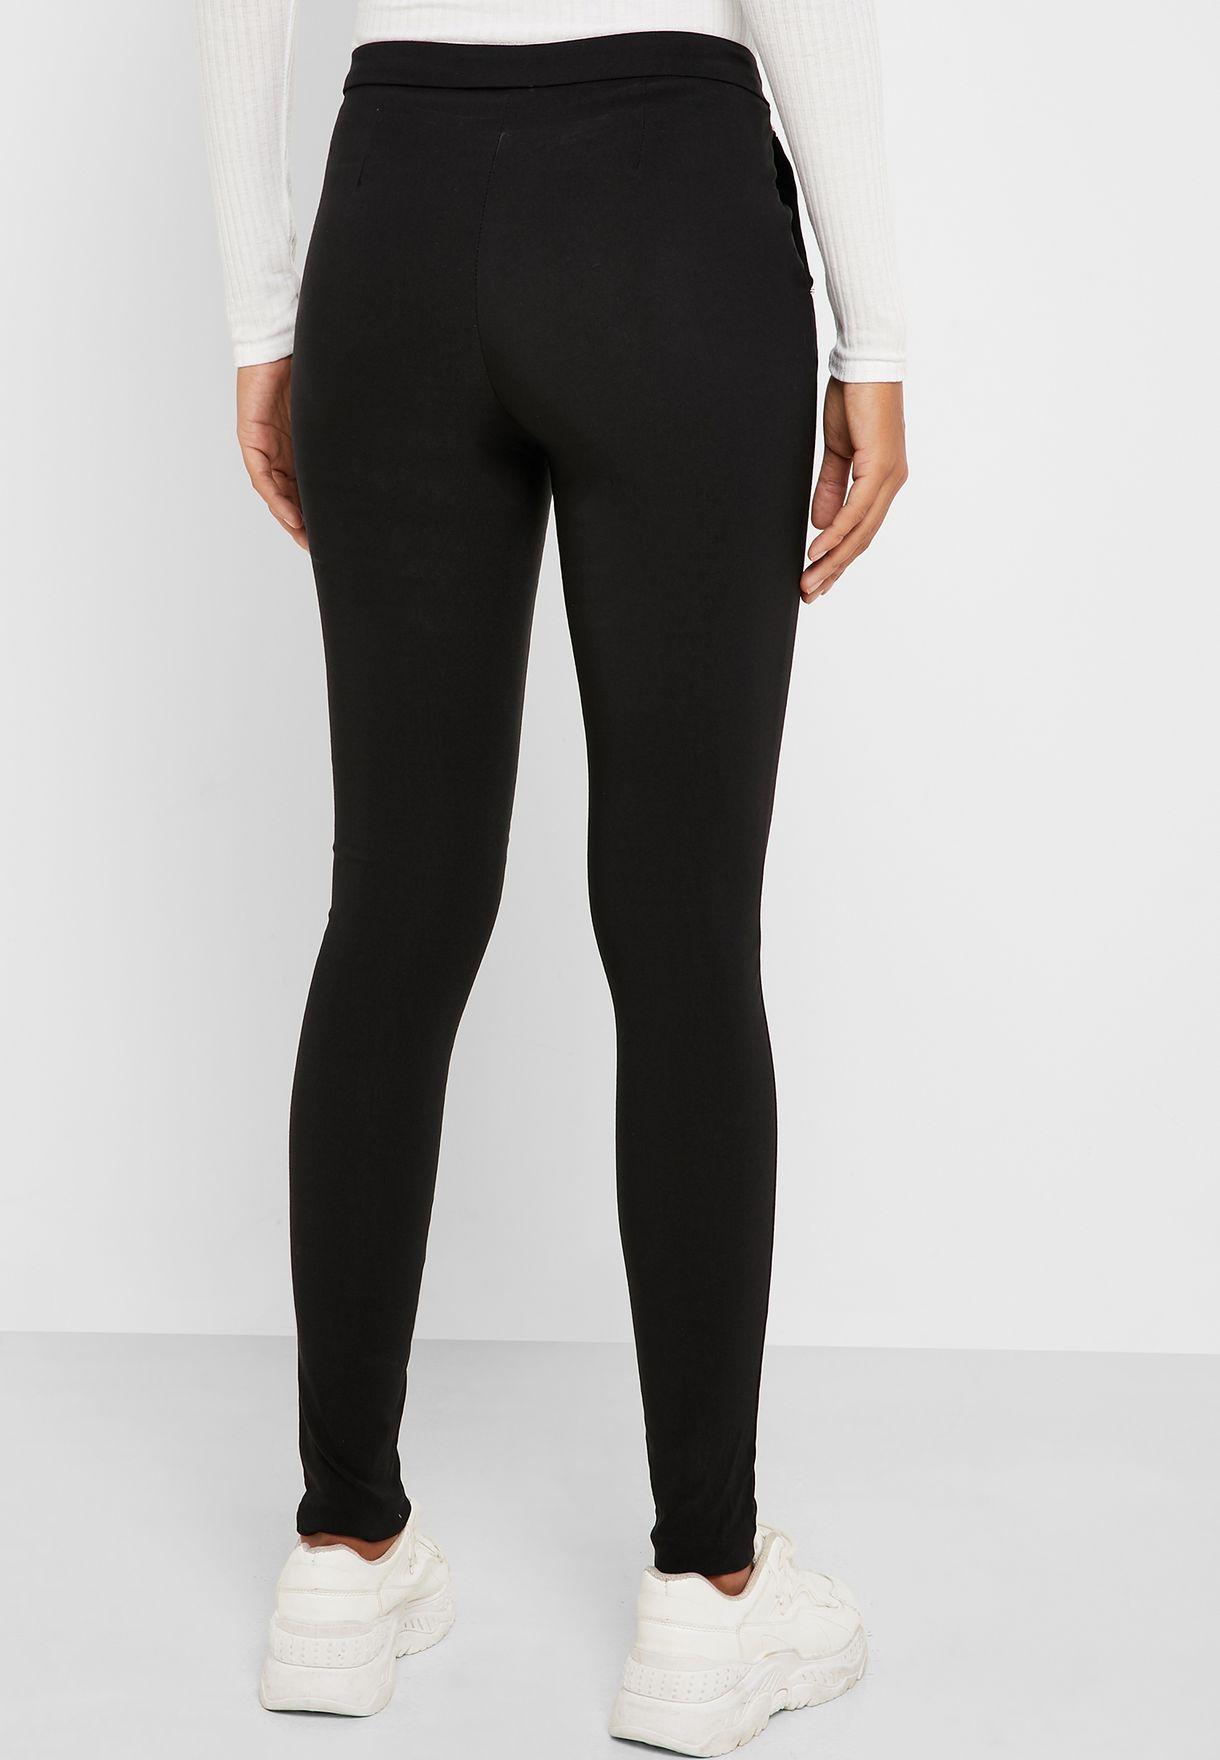 High Waist Slim Pants